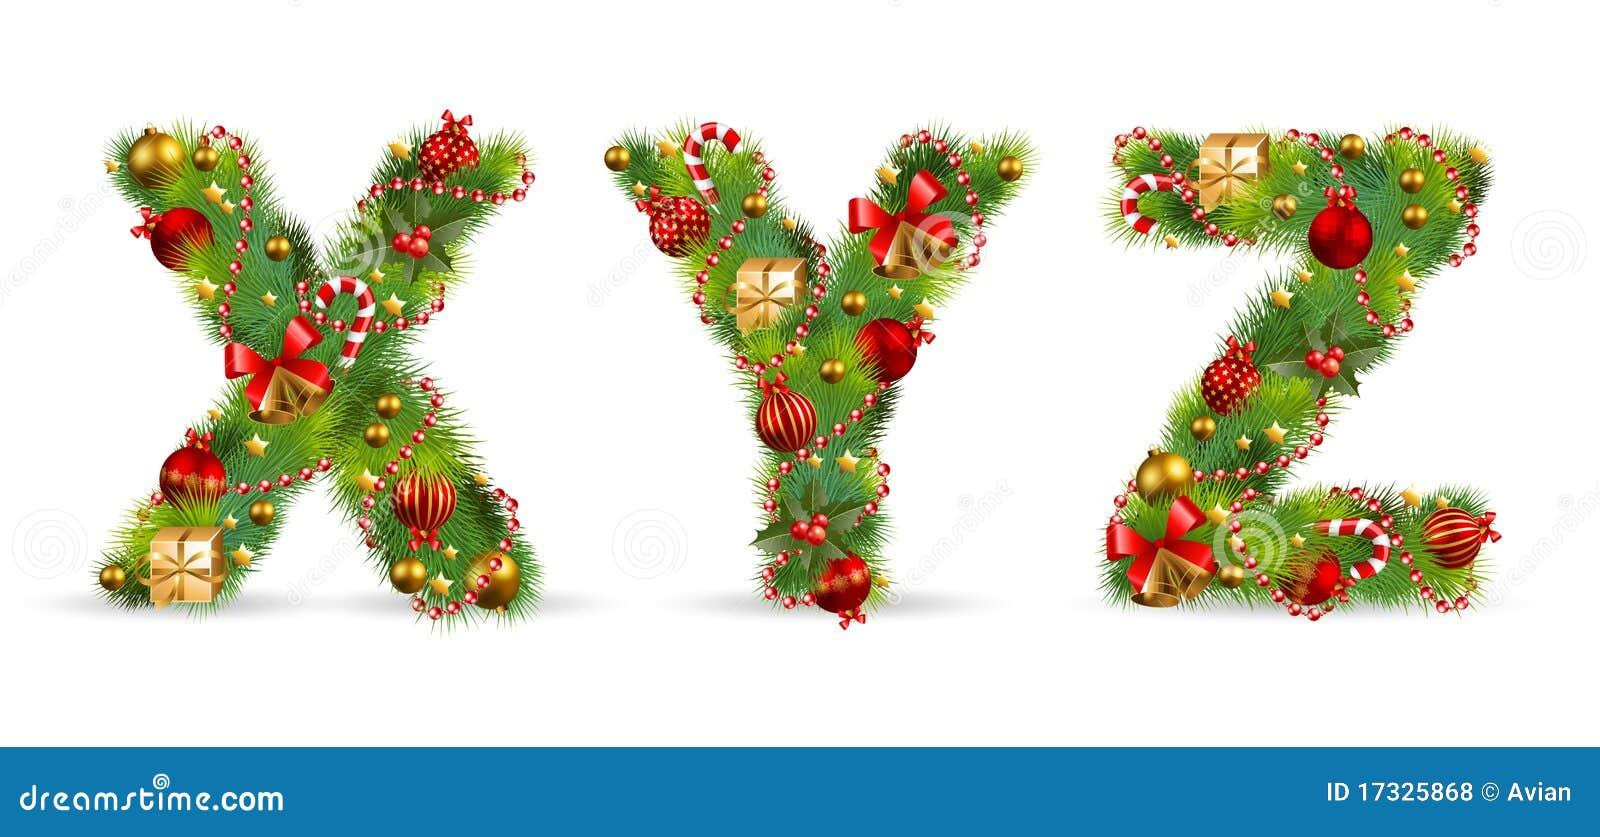 XYZ, Christmas Tree Font Royalty Free Stock Photos - Image: 17325868